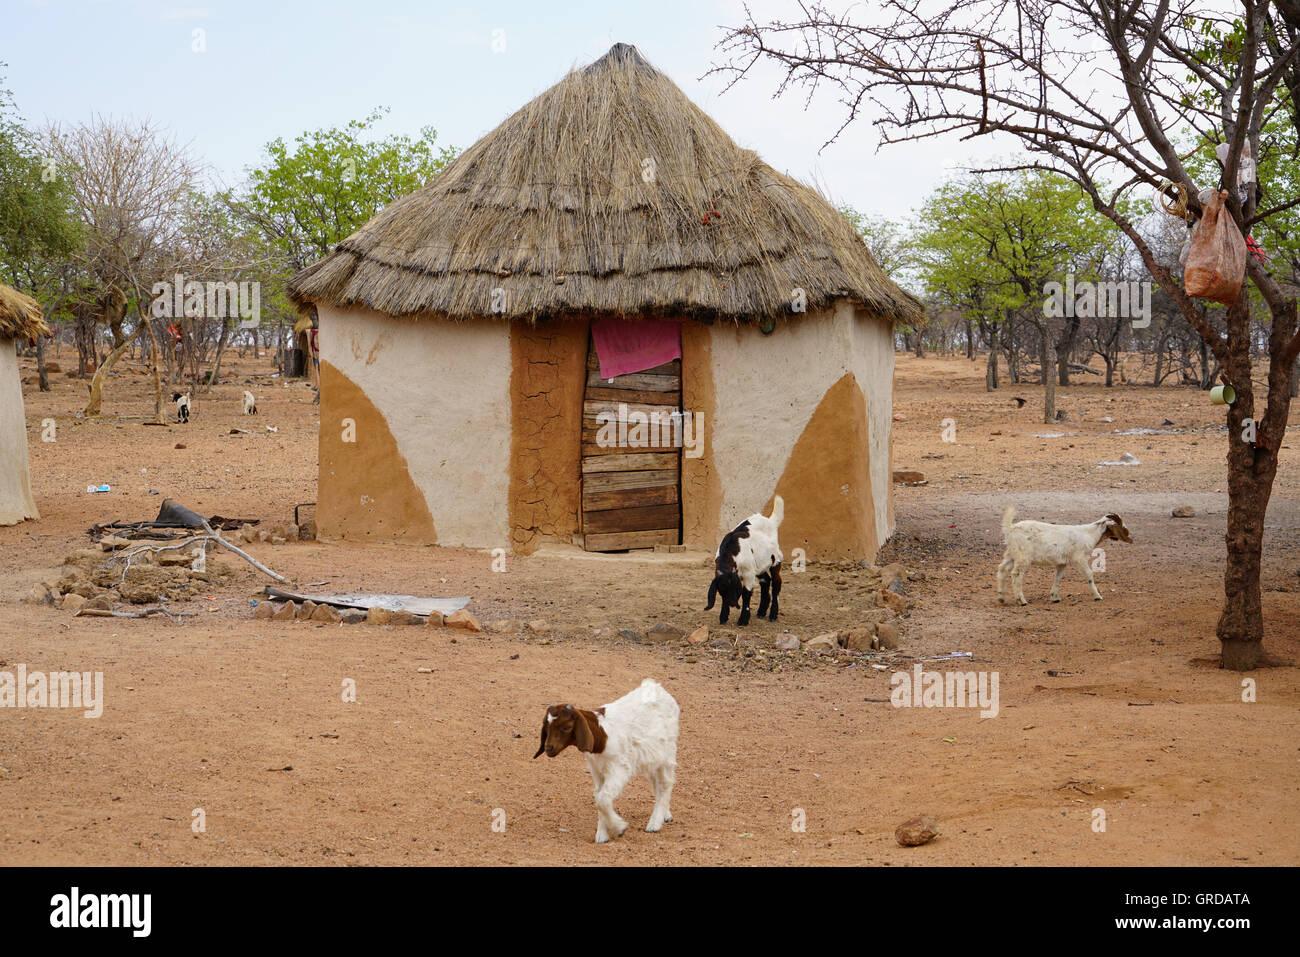 Himba Village - Stock Image